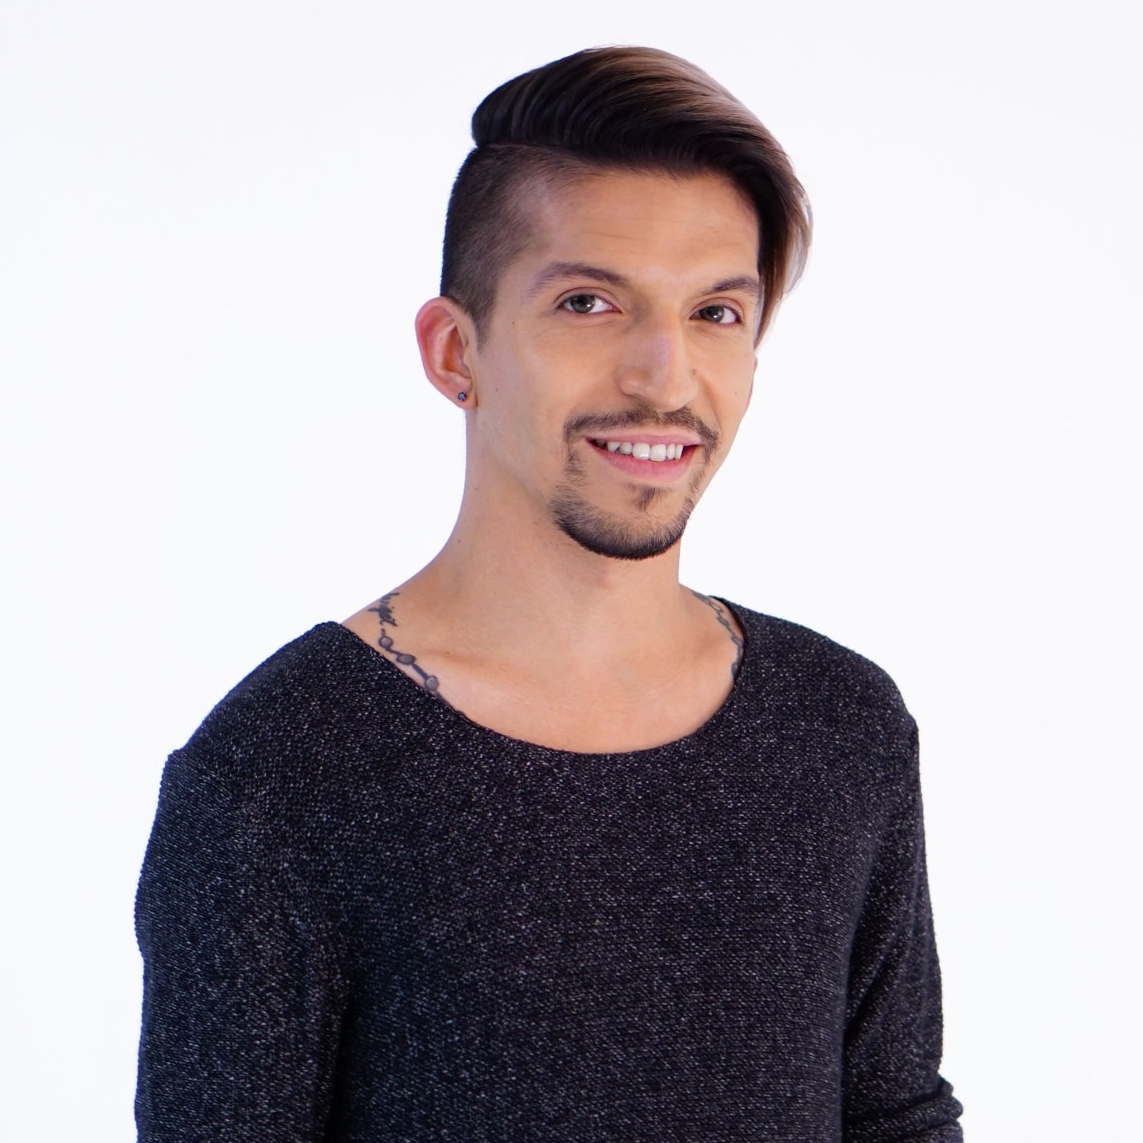 Brandon Burciaga